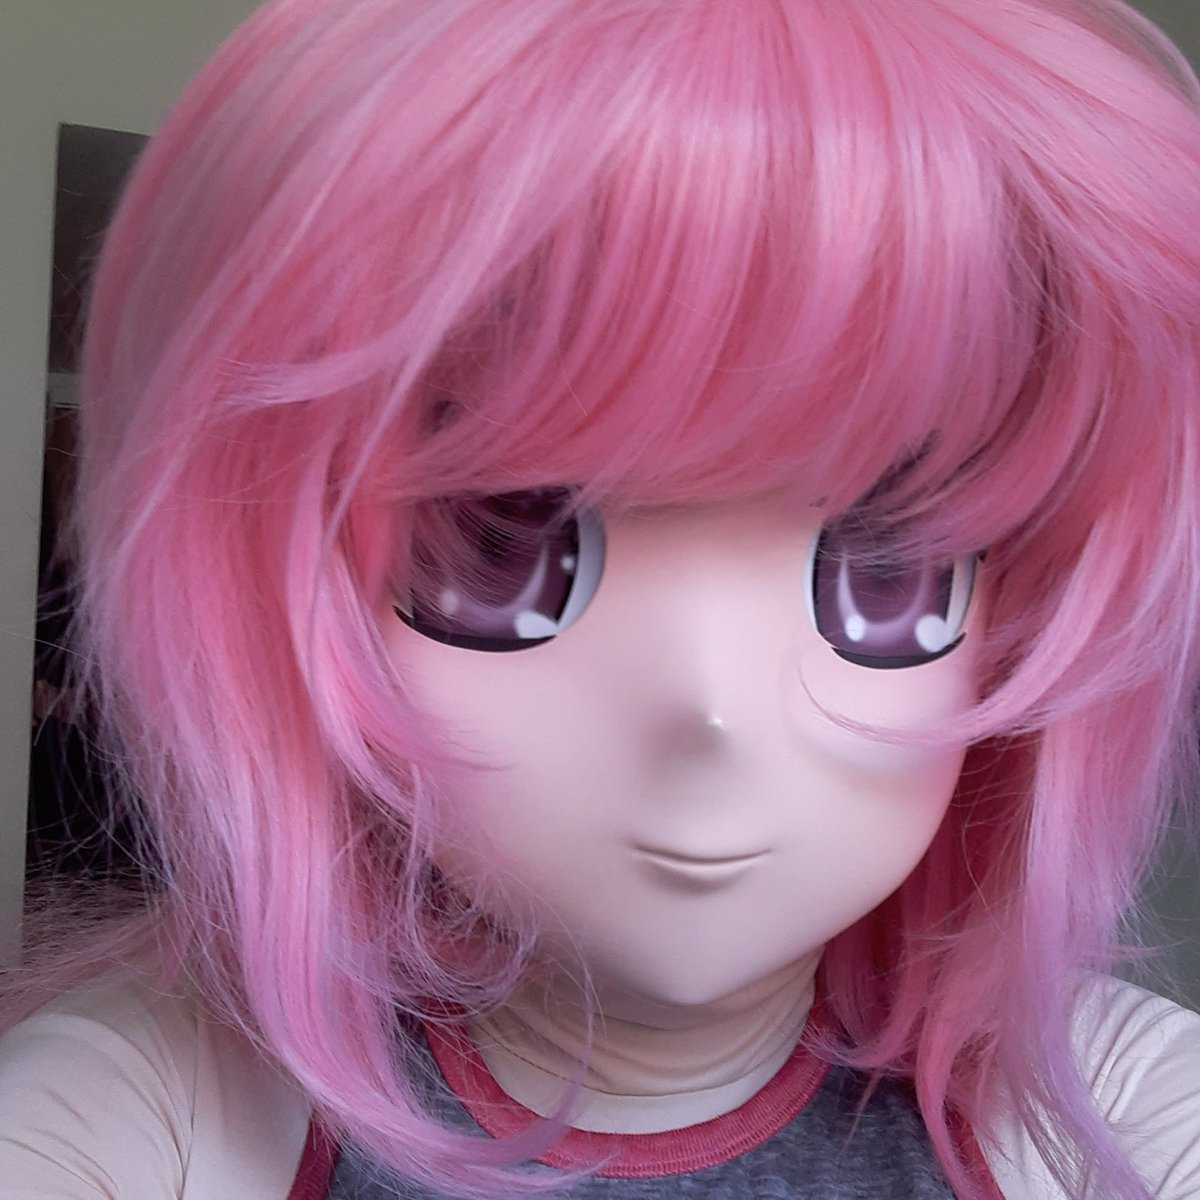 Amy enjoying the summer and relaxing.  #cosplayer #cosplay #cosplaylife #cosplayfun #kigurumi #animegao #mask #animepic.twitter.com/PWwCTUb0dk